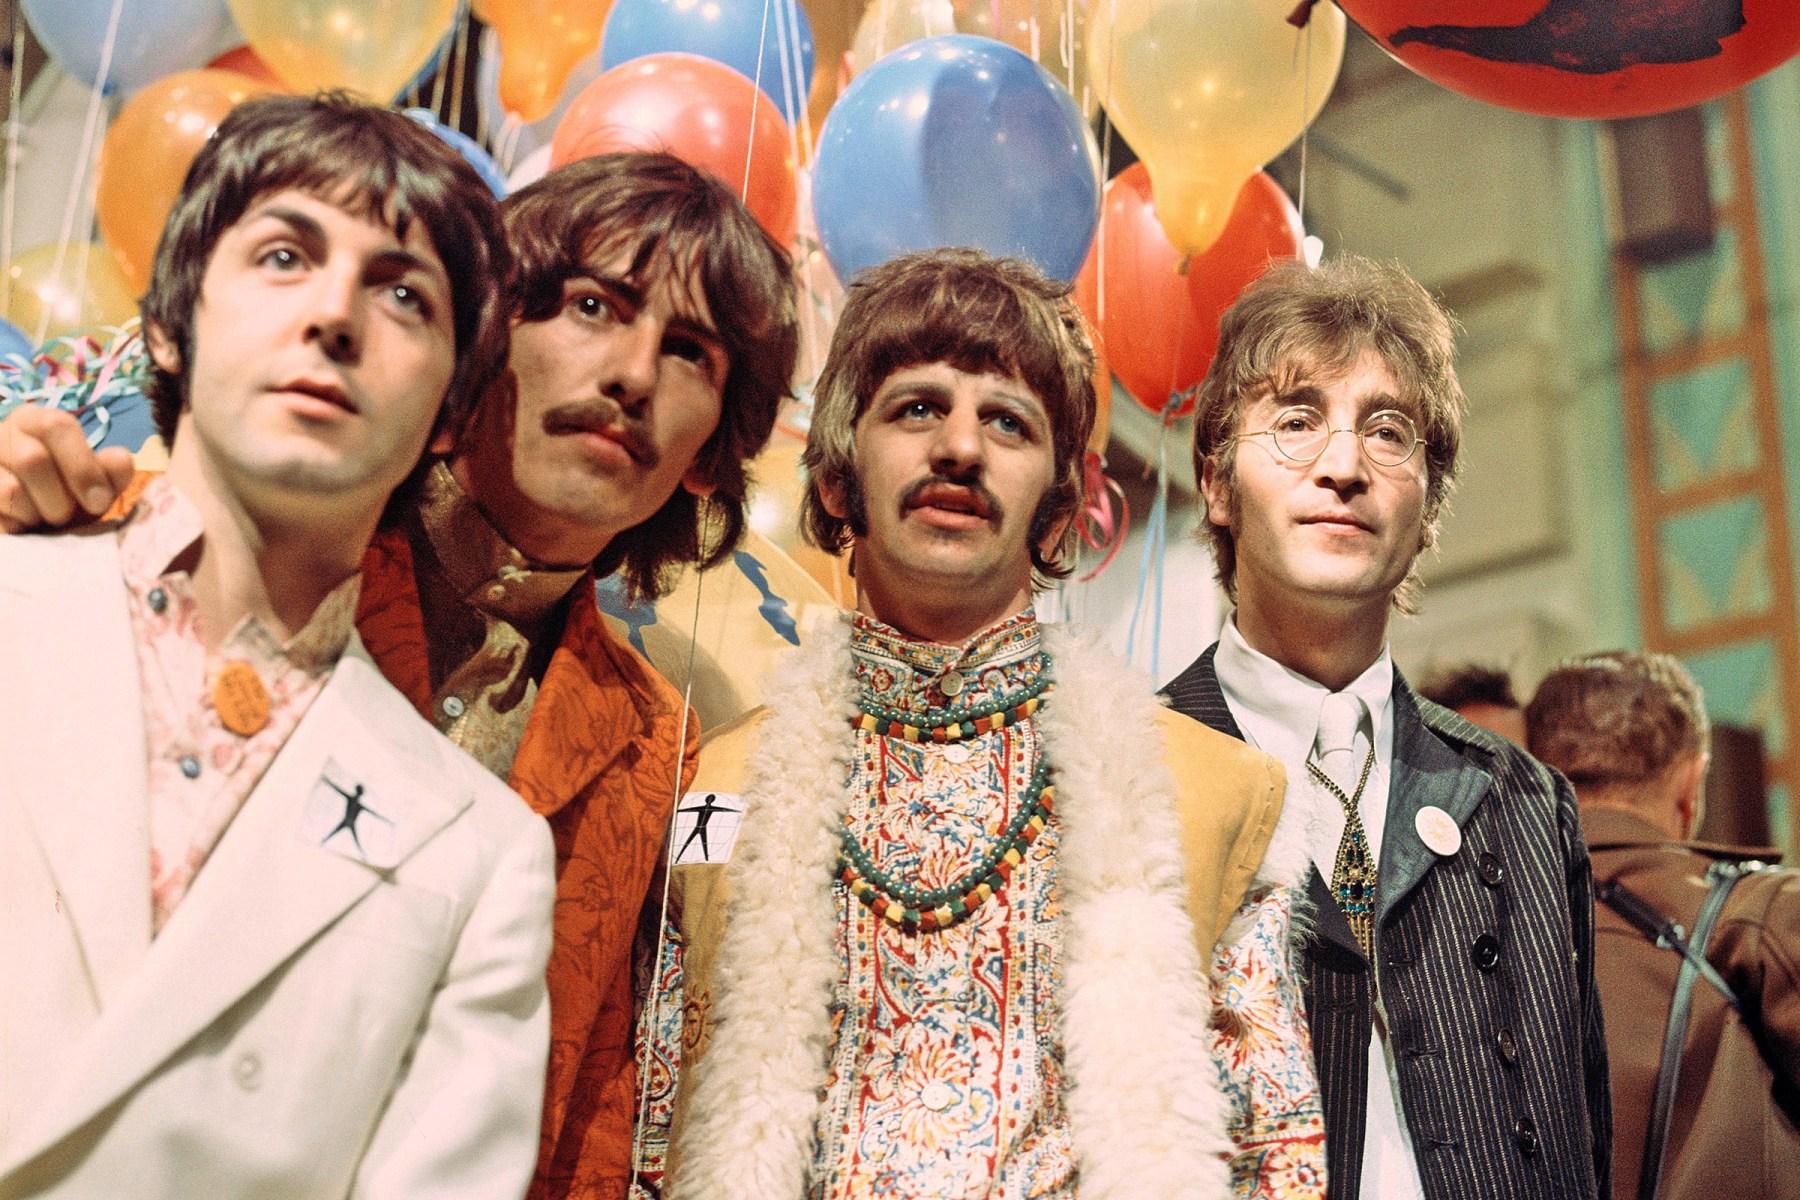 The Beatles - Paul McCartney, George Harrison, Ringo Starr and John LennonVarious - 1967